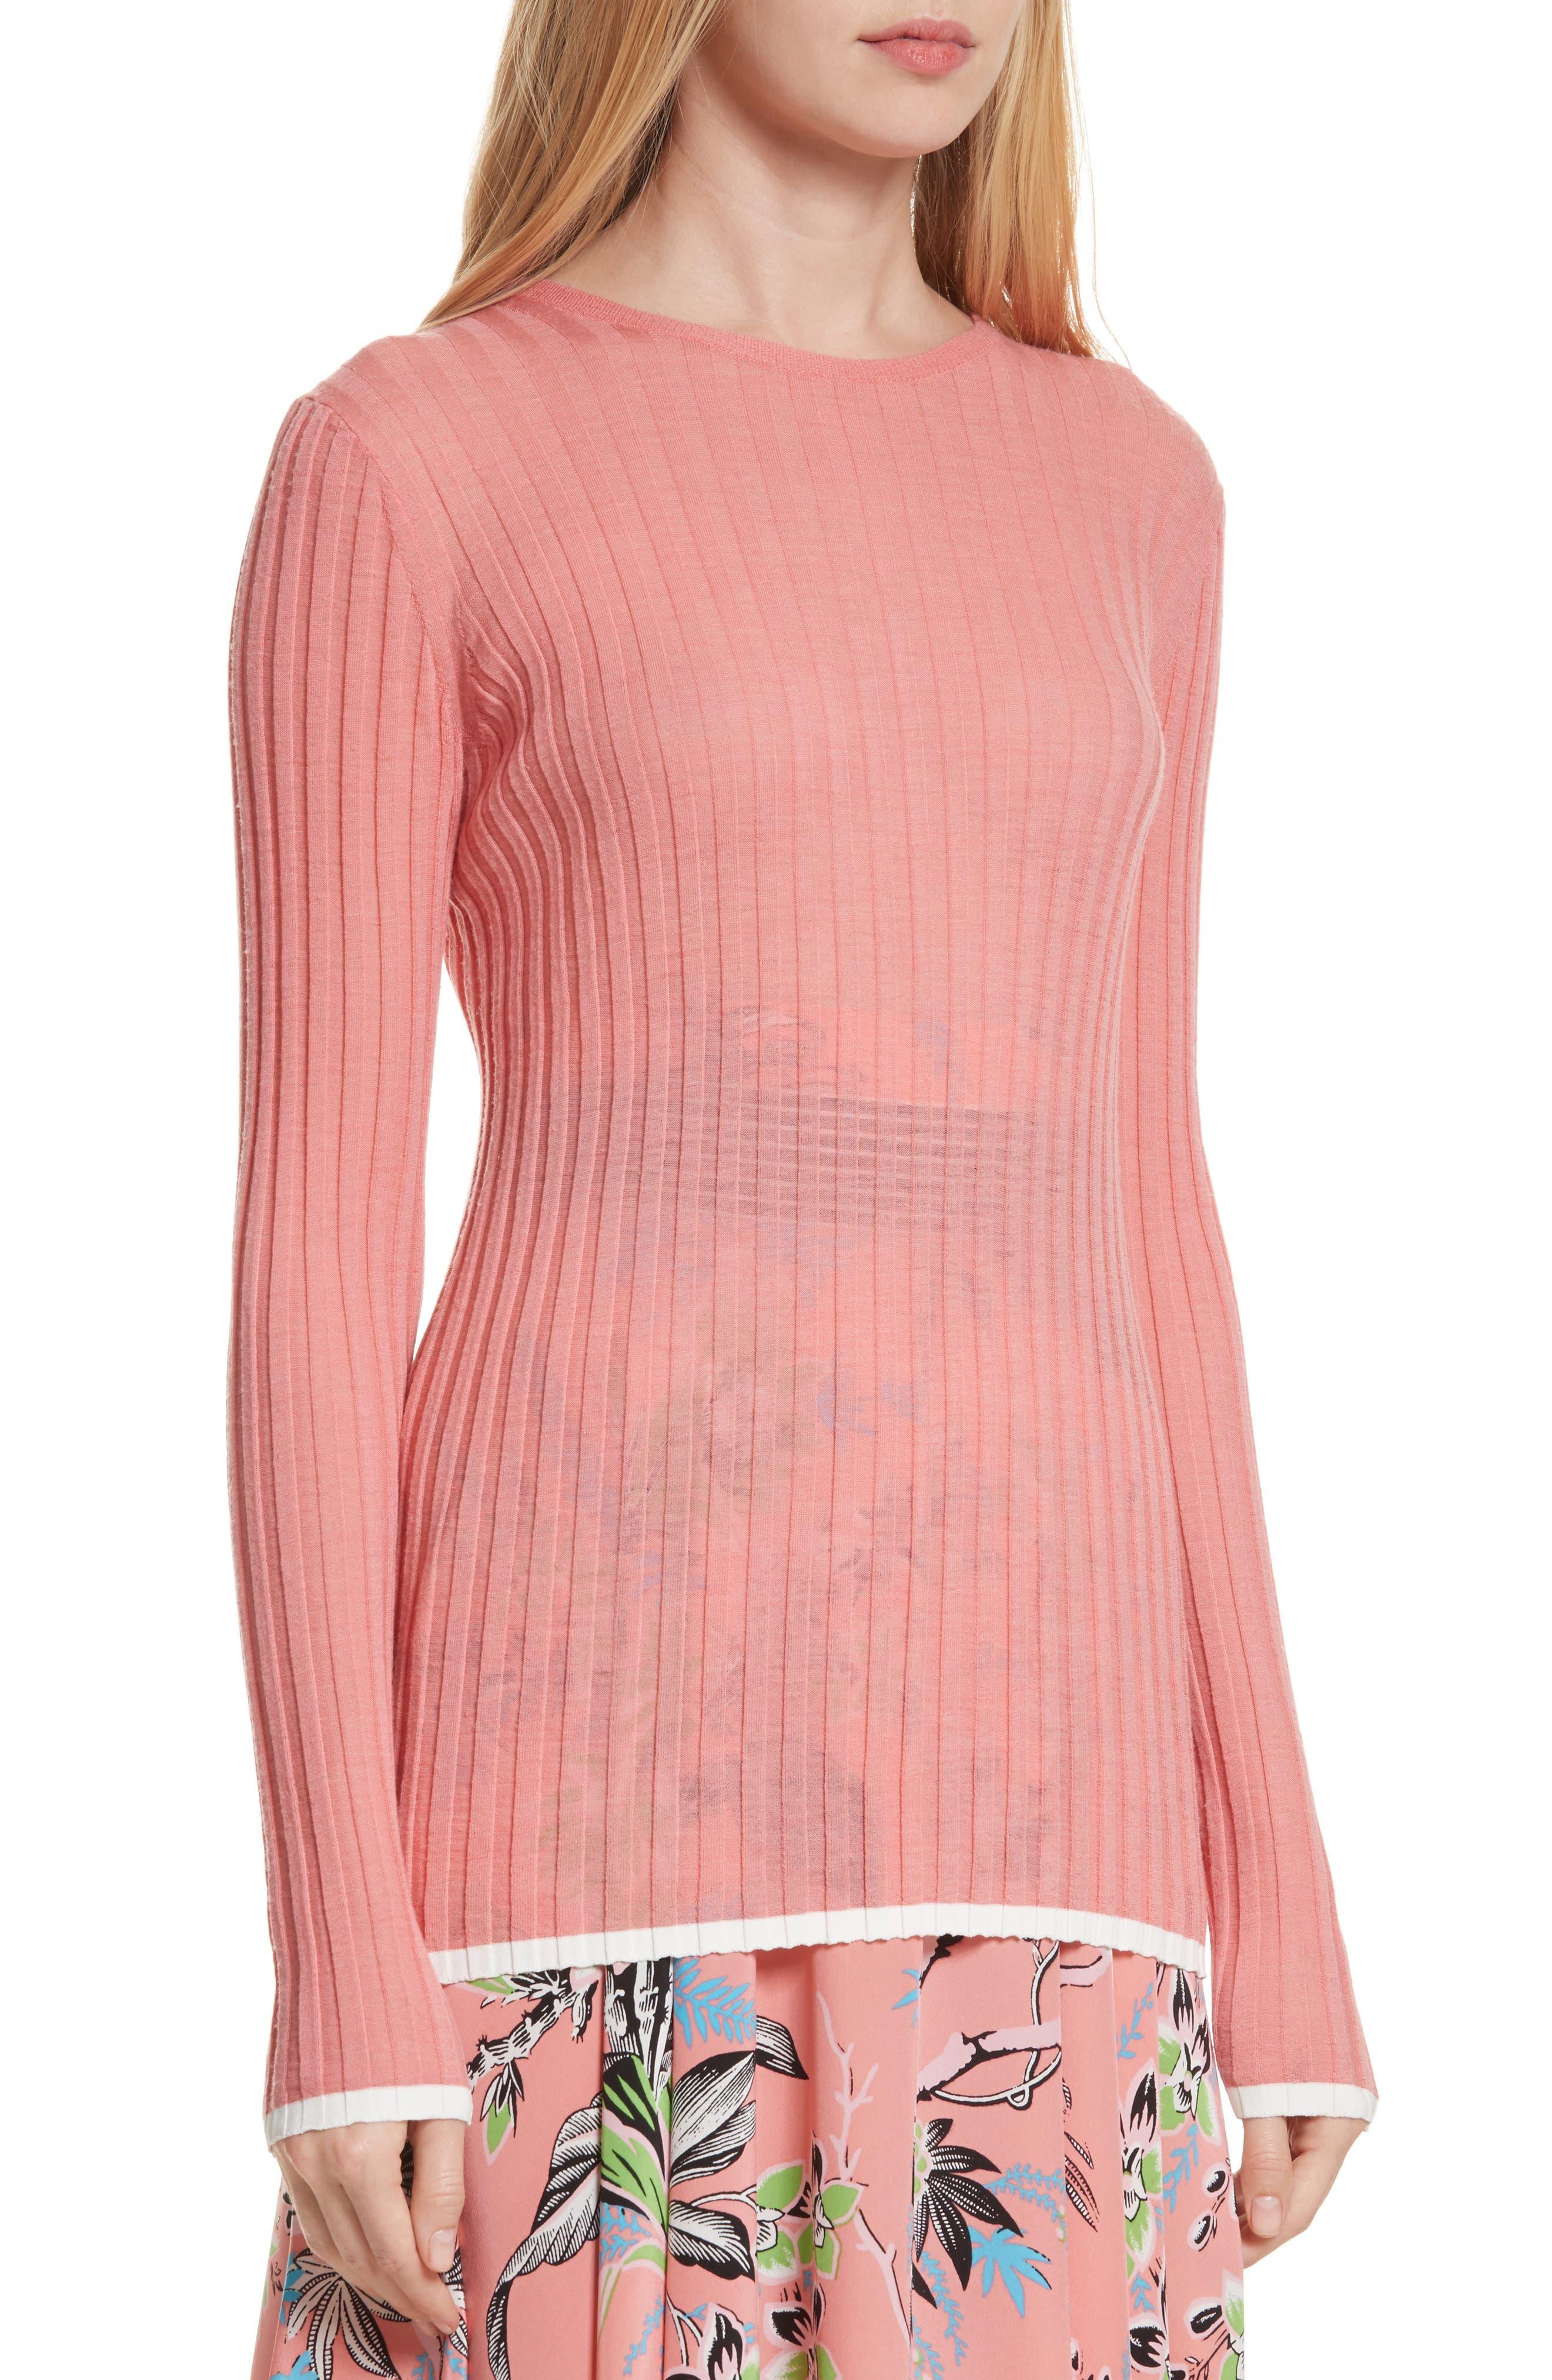 Diane von Furstenberg Ribbed Sweater,                             Alternate thumbnail 4, color,                             Hyacinth/ Ivory